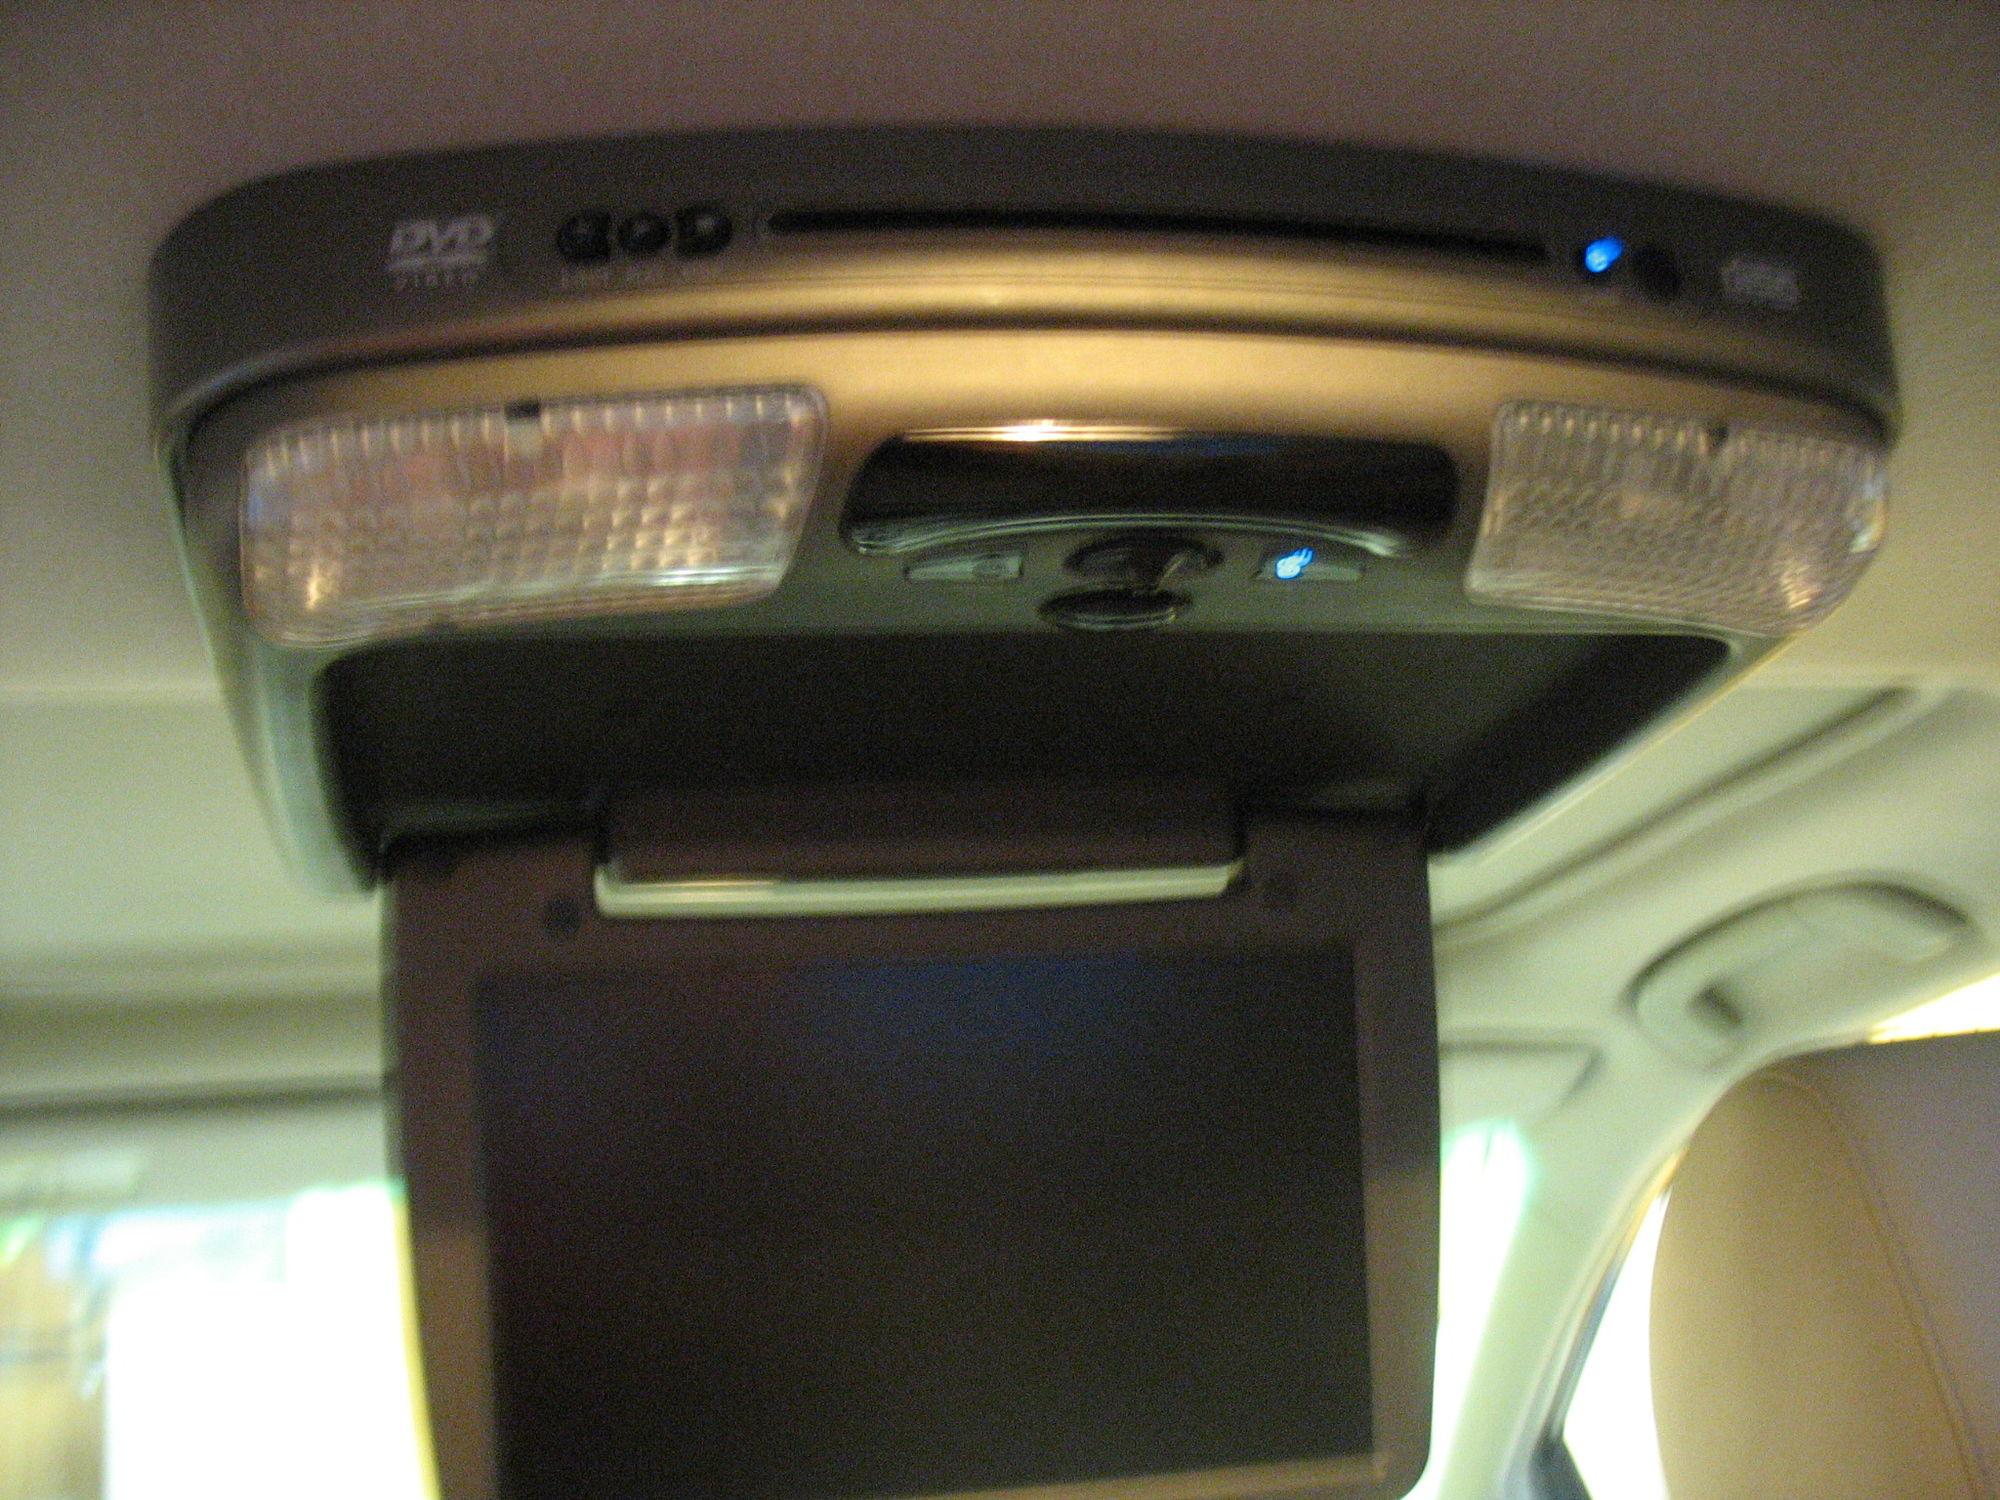 RX 350 Rear DVD Player ClubLexus Lexus Forum Discussion